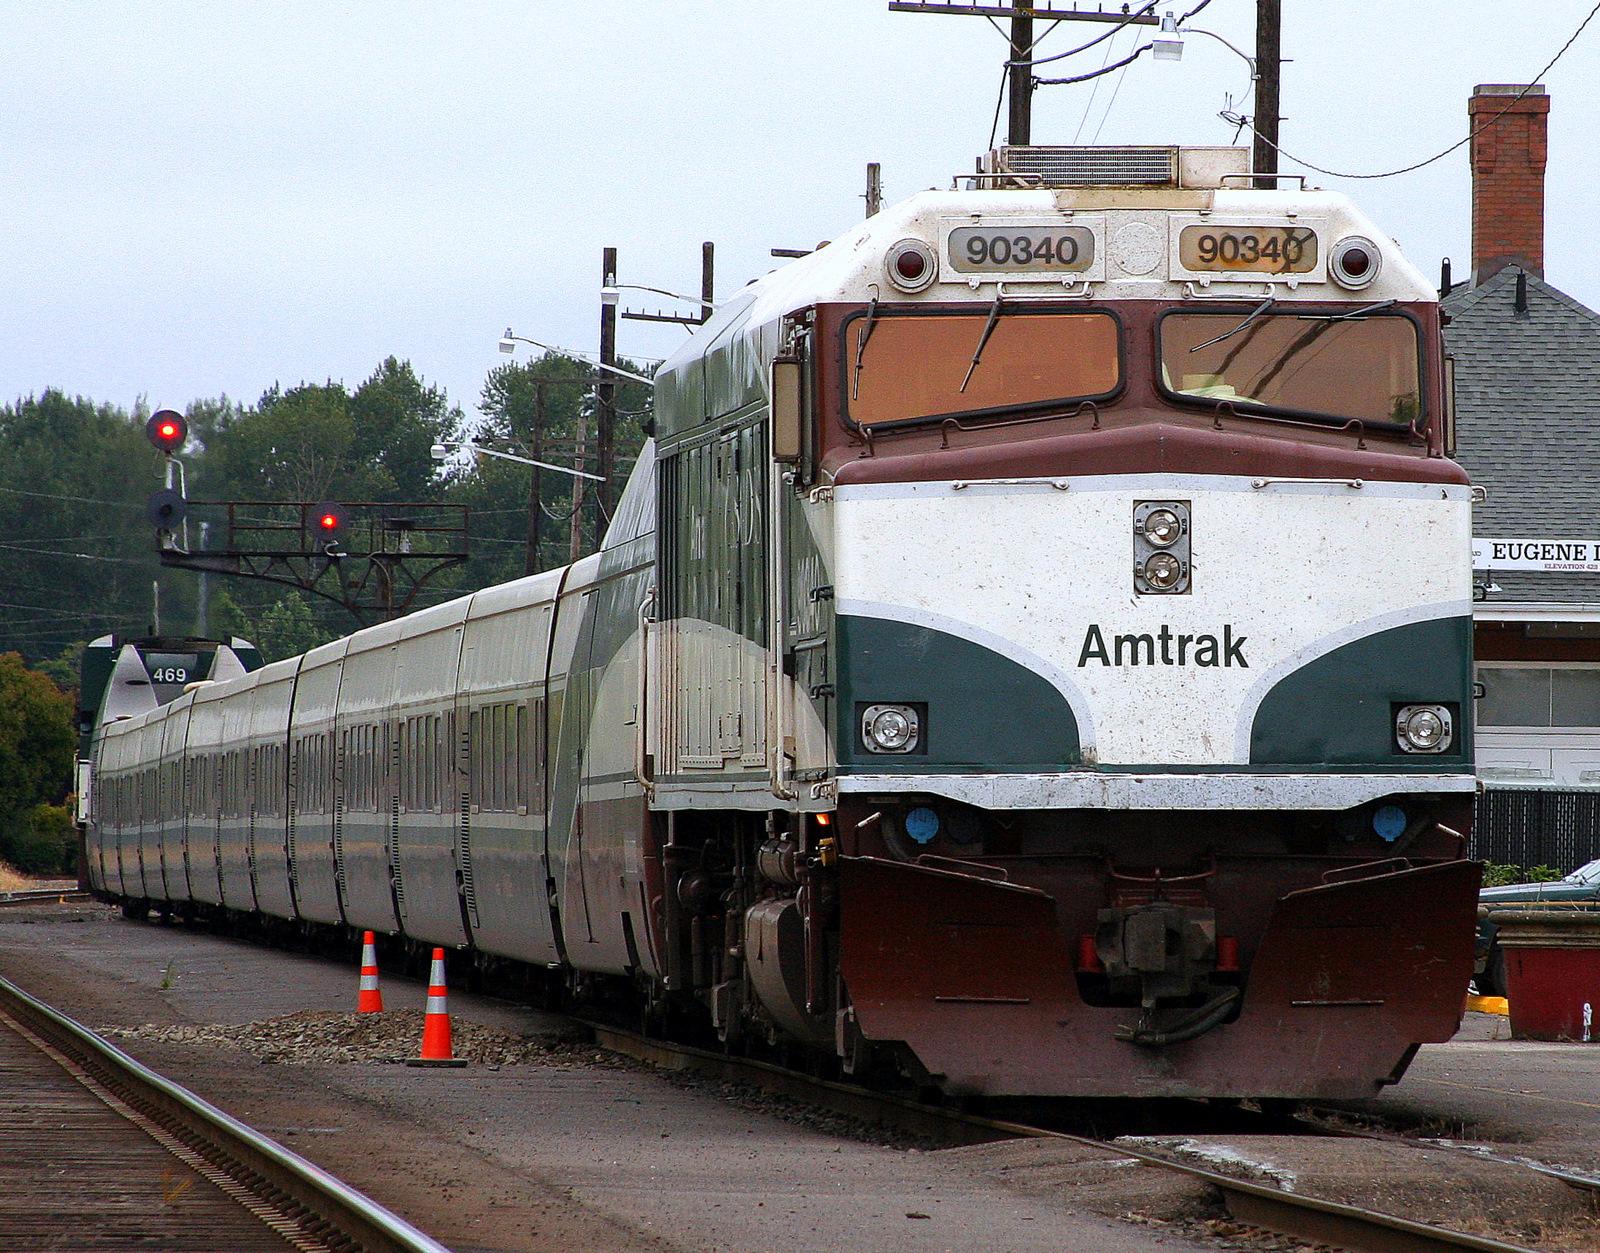 Amtrak >> File:Talgo Amtrak Cascades - Eugene - Bruce Fingerhood.jpg ...